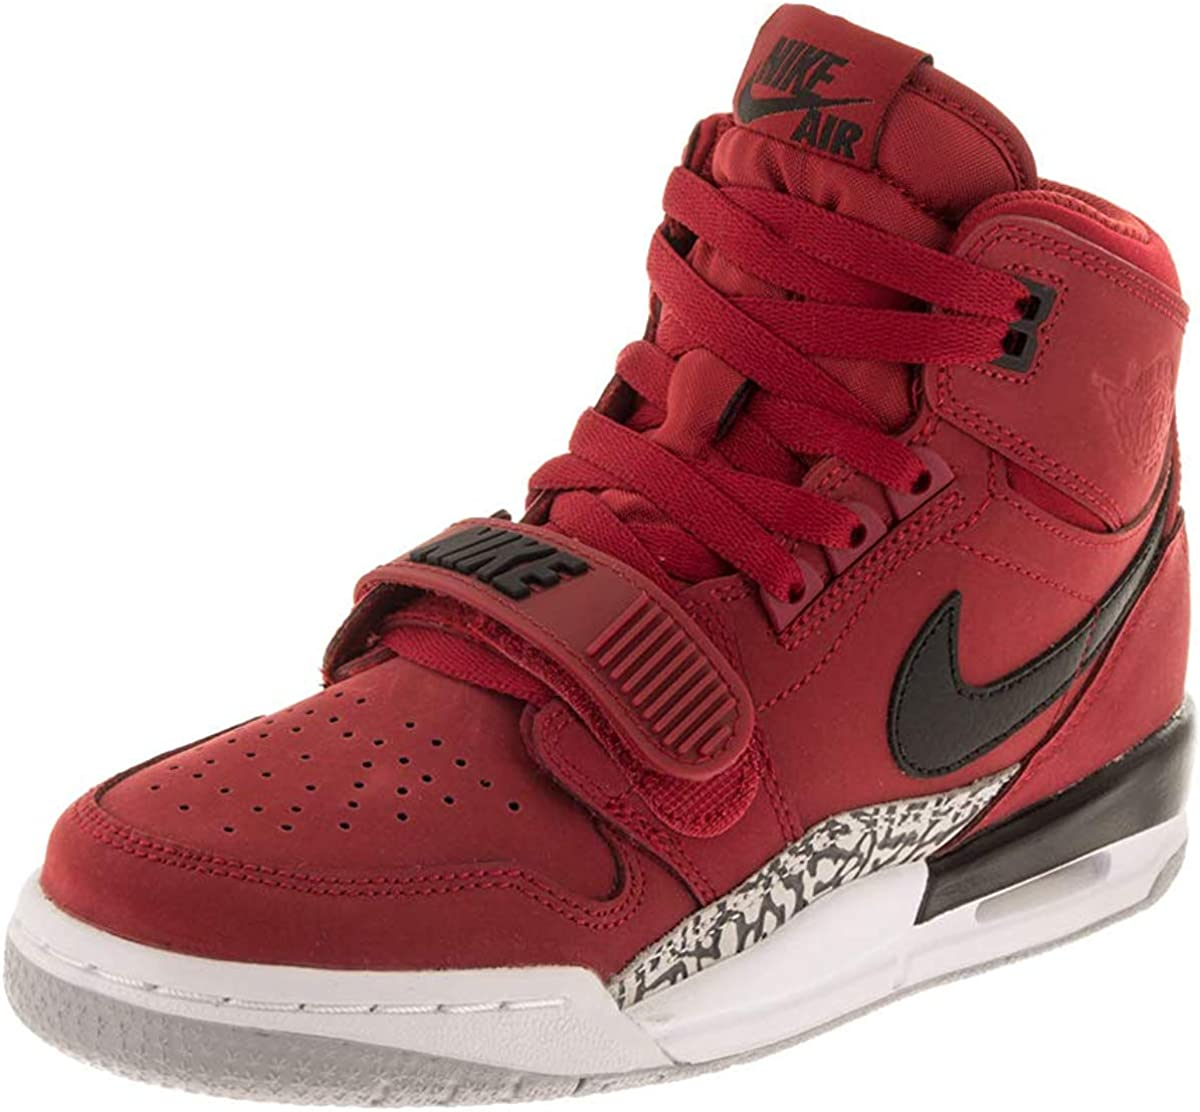 nike jordan basket ball shoes